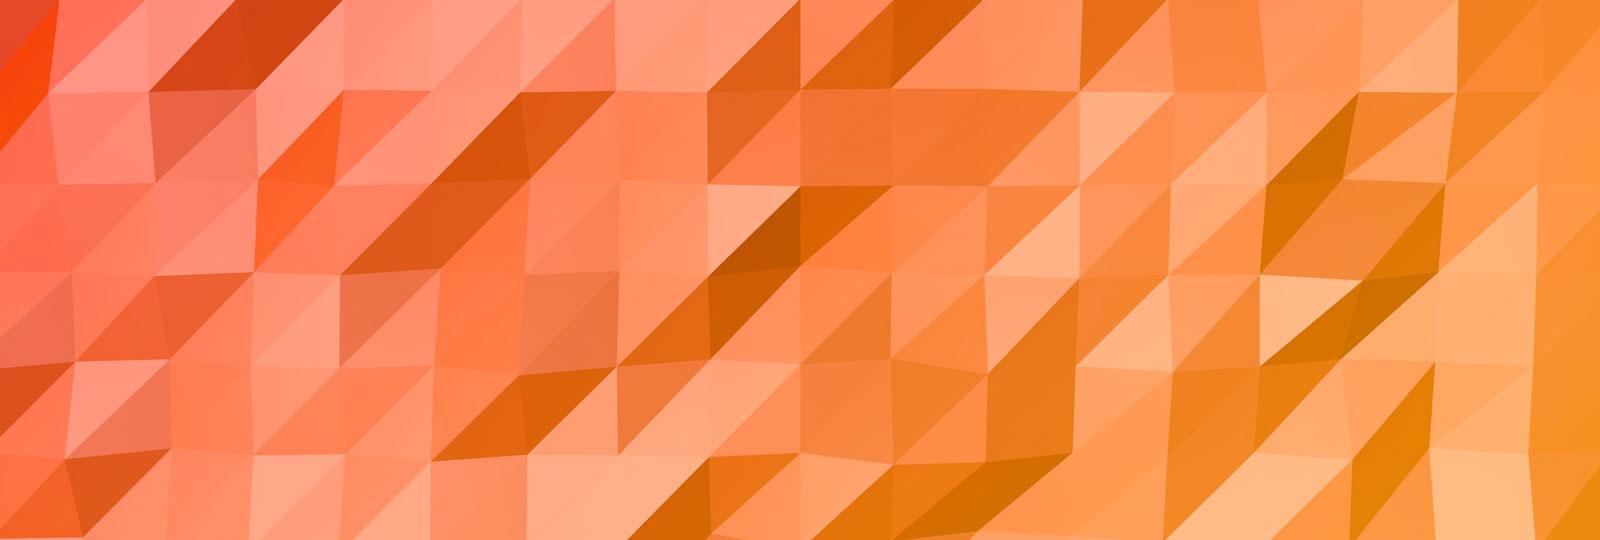 orange-wallpaper-crop.jpg